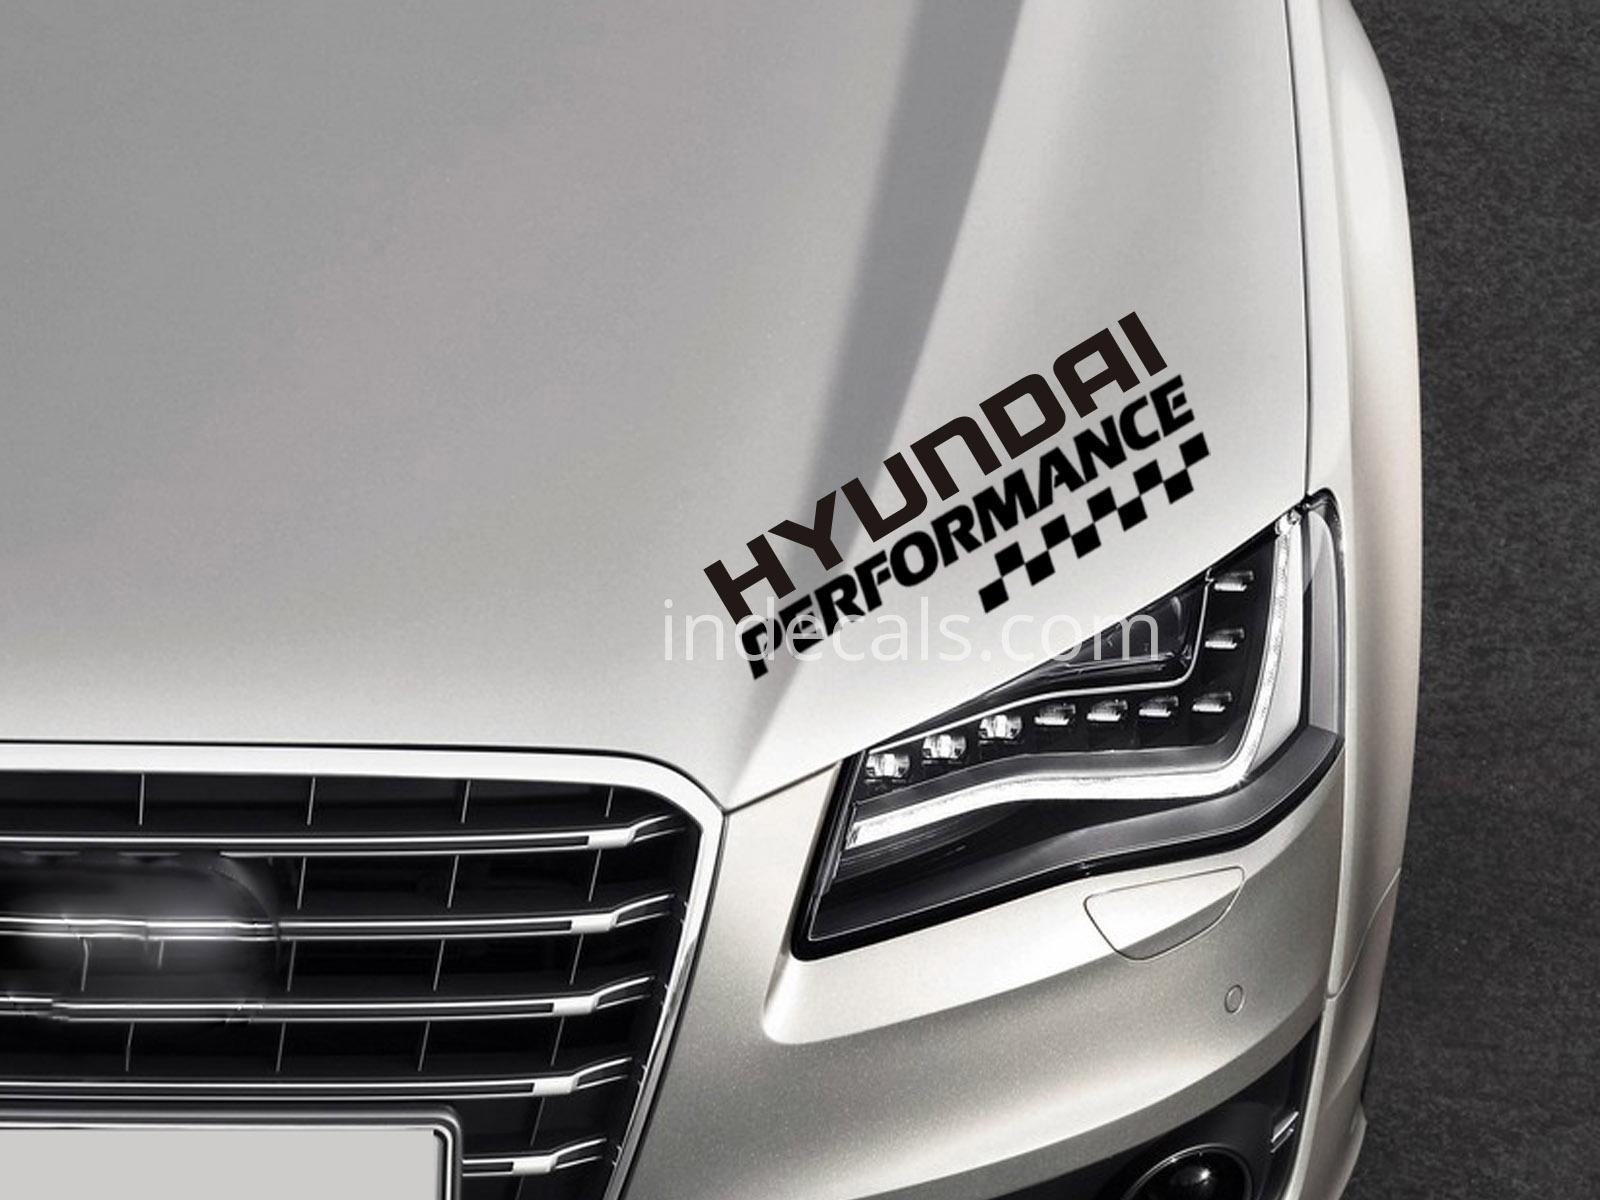 1 X Hyundai Performance Sticker Black Indecals Com